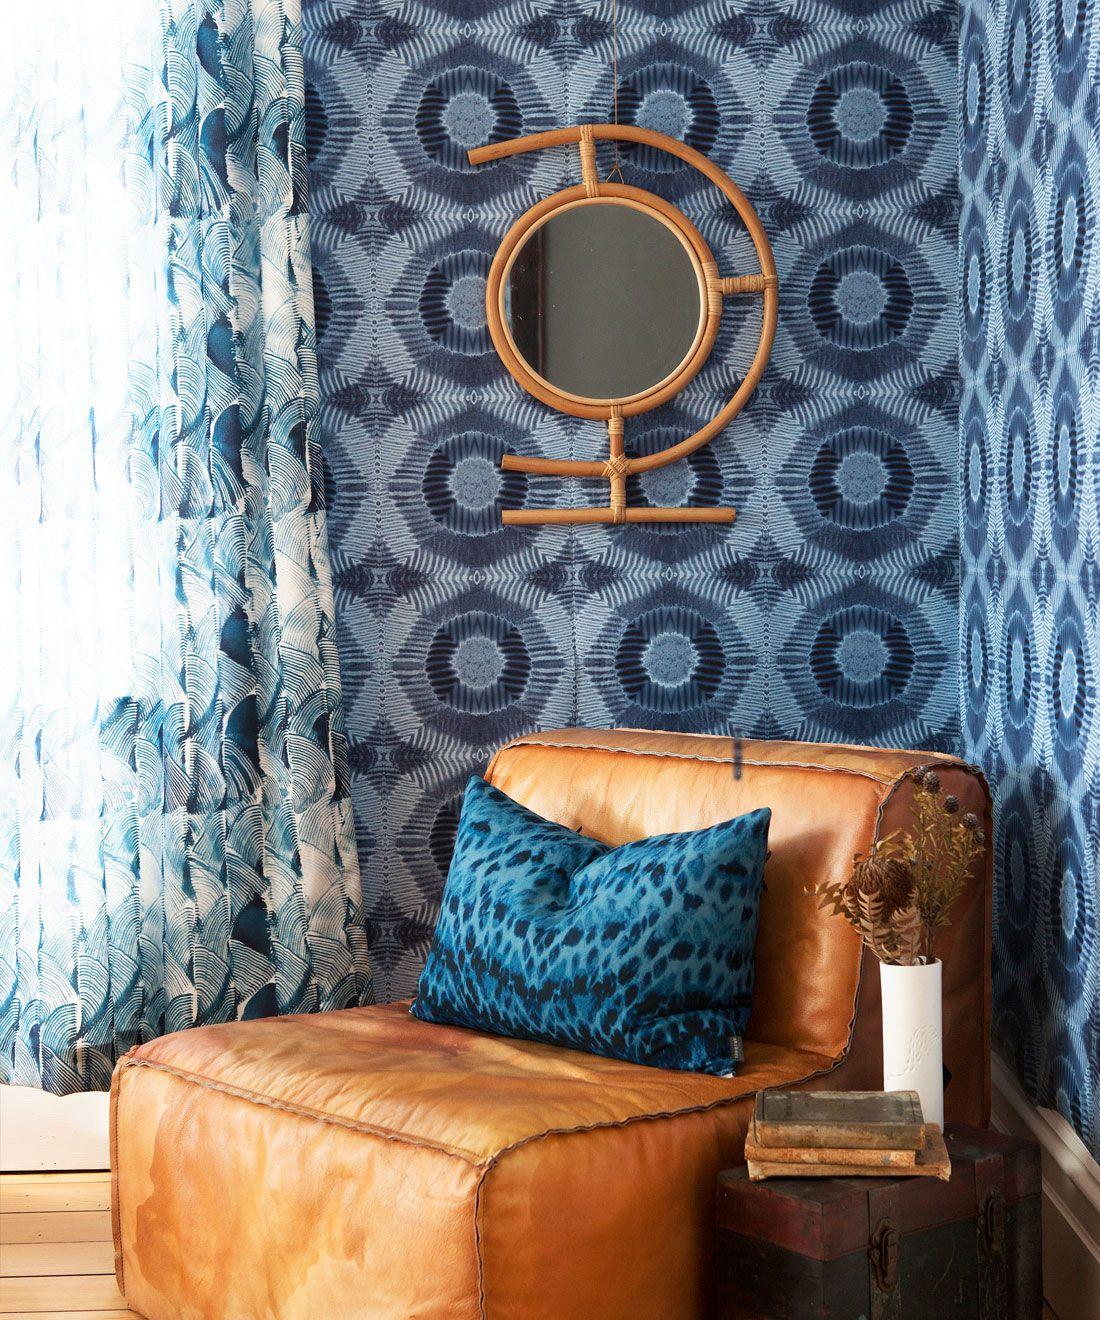 Aztec Suns Wallpaper Indigo Blue • Shibori Geometric • Insitu